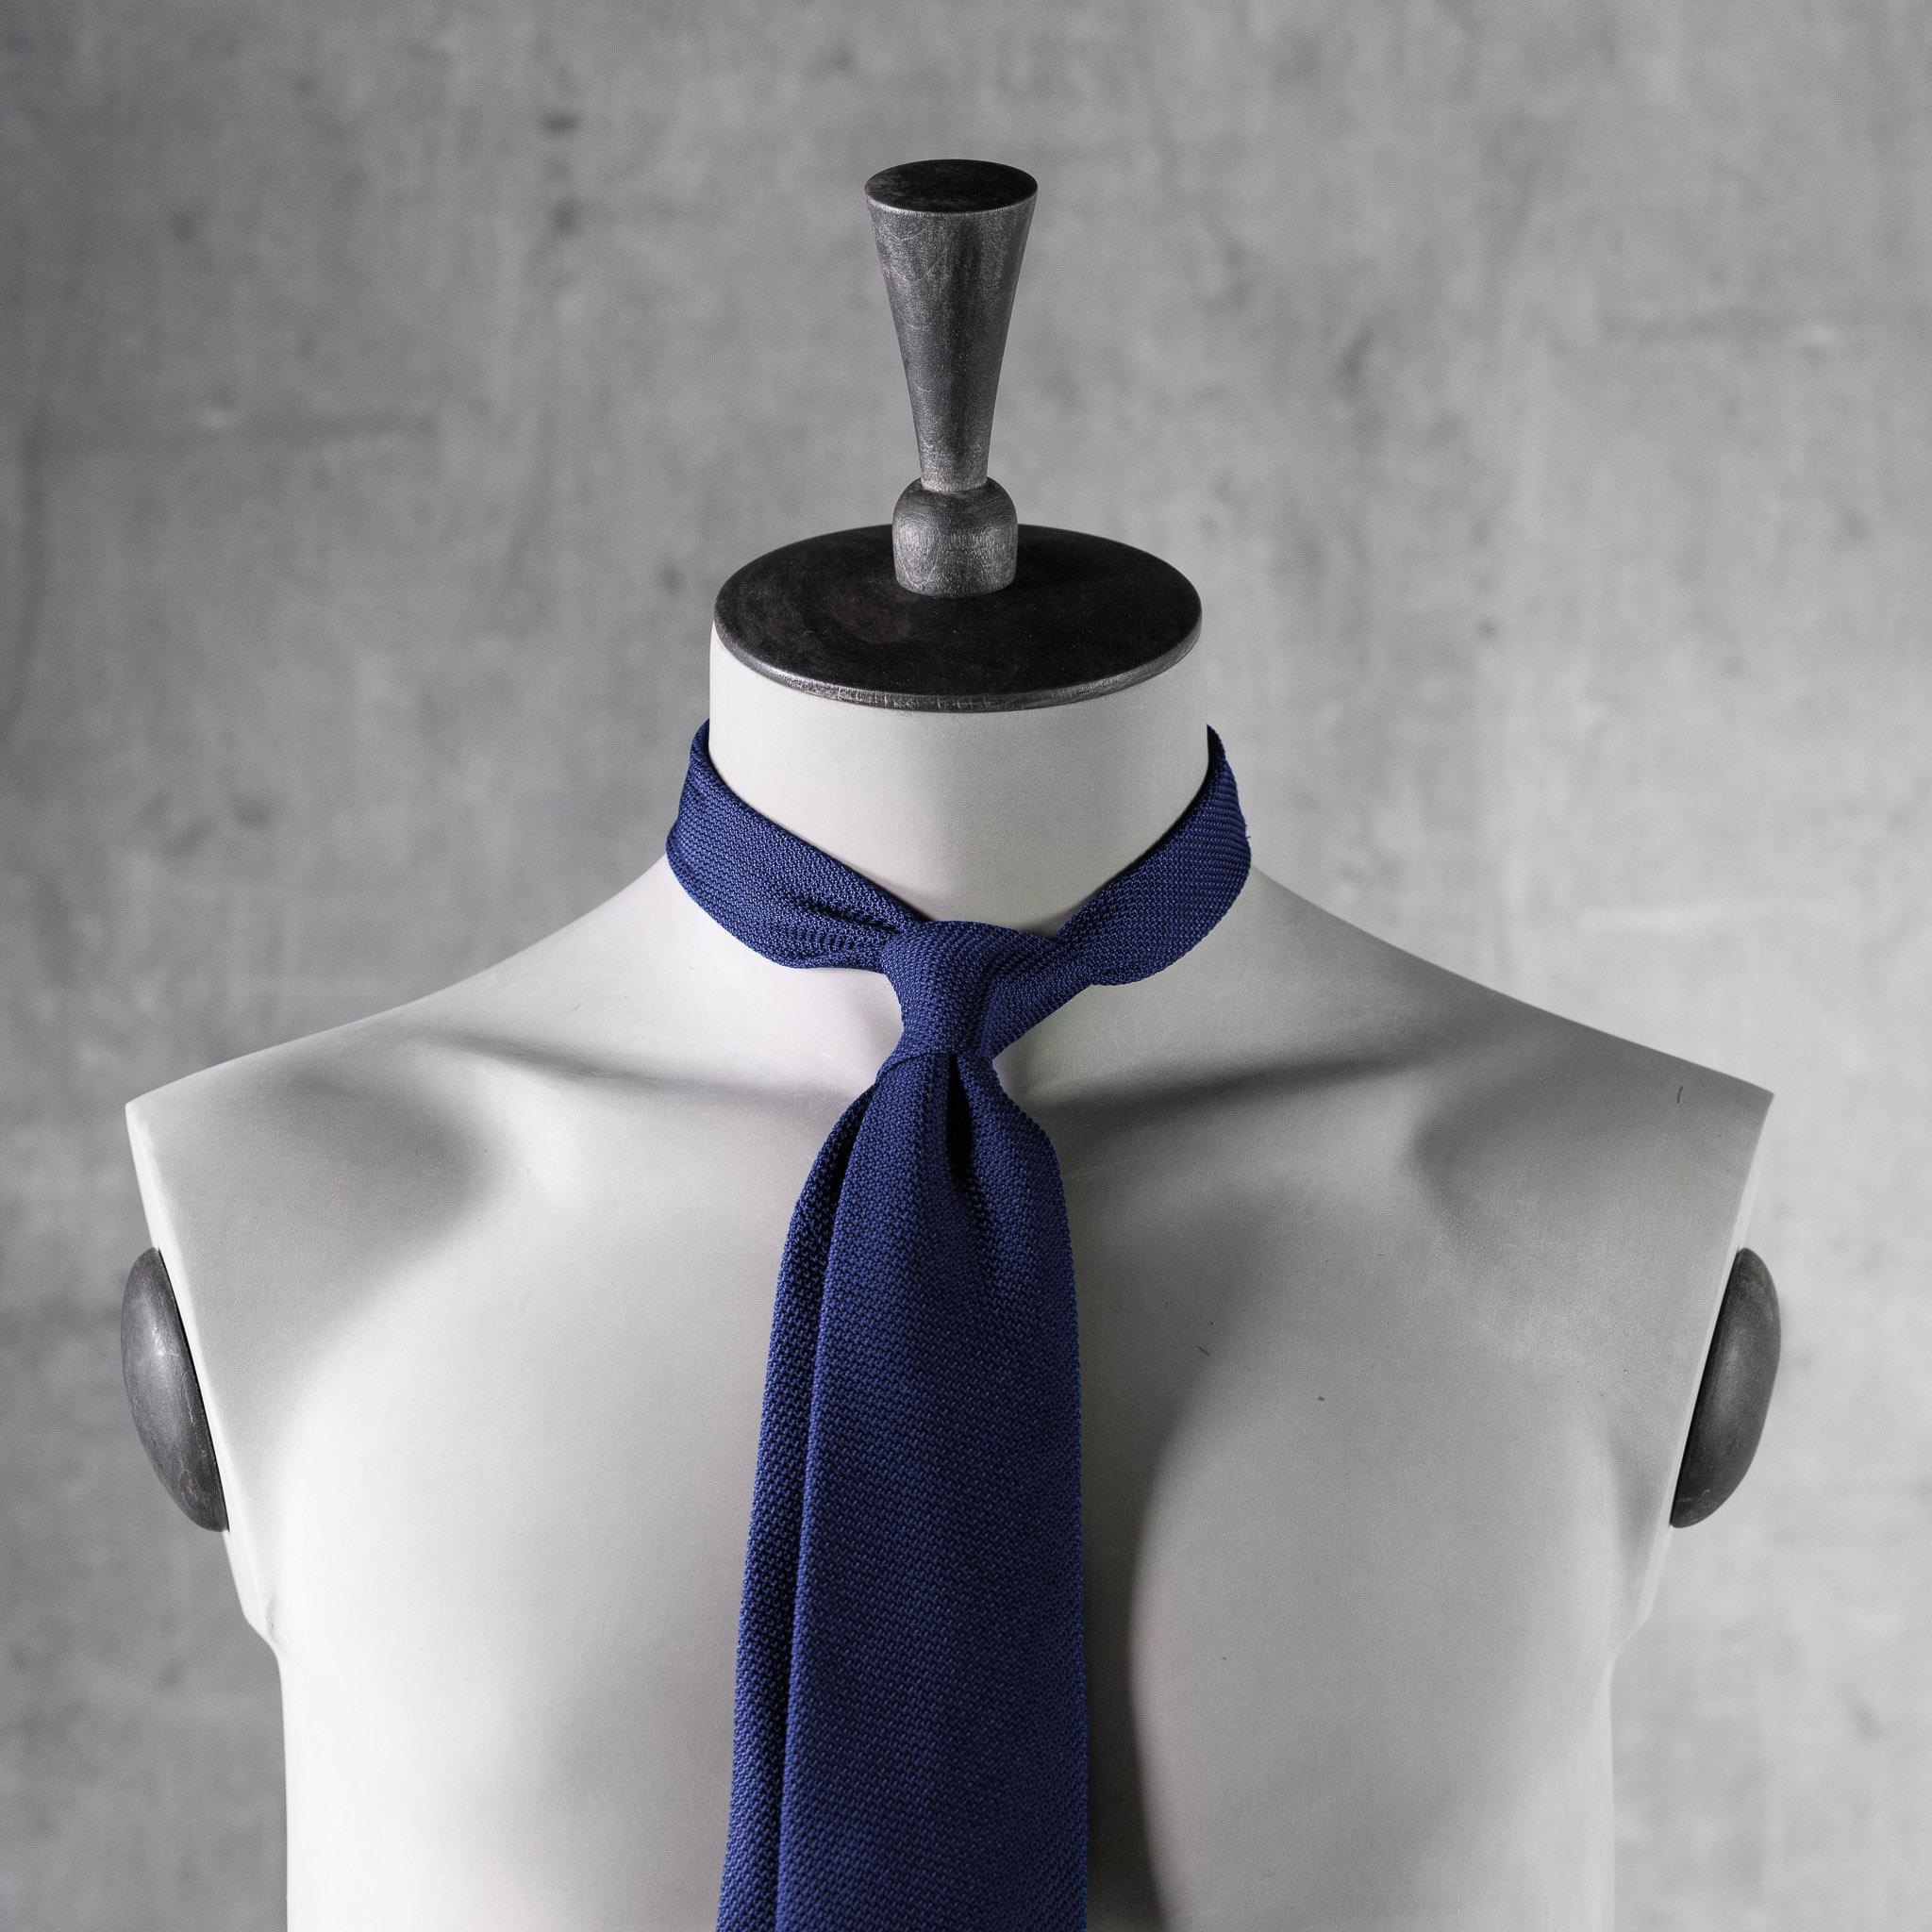 GRENADINE-0156-Tie-Initials-Corbata-Iniciales-The-Seelk-4